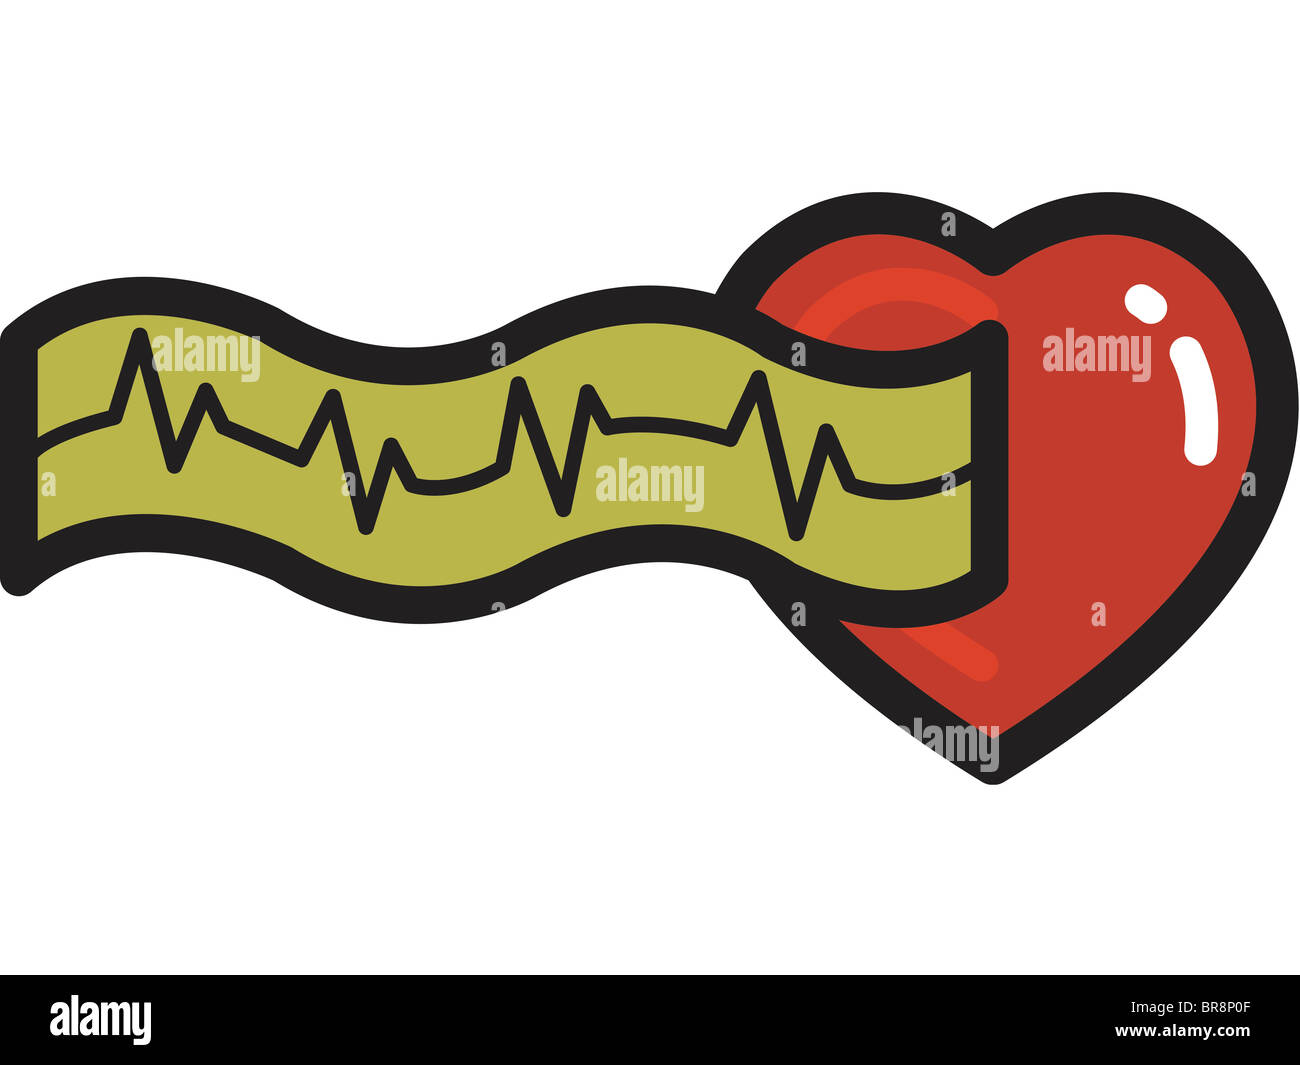 Illustration of electrocardiogram - Stock Image